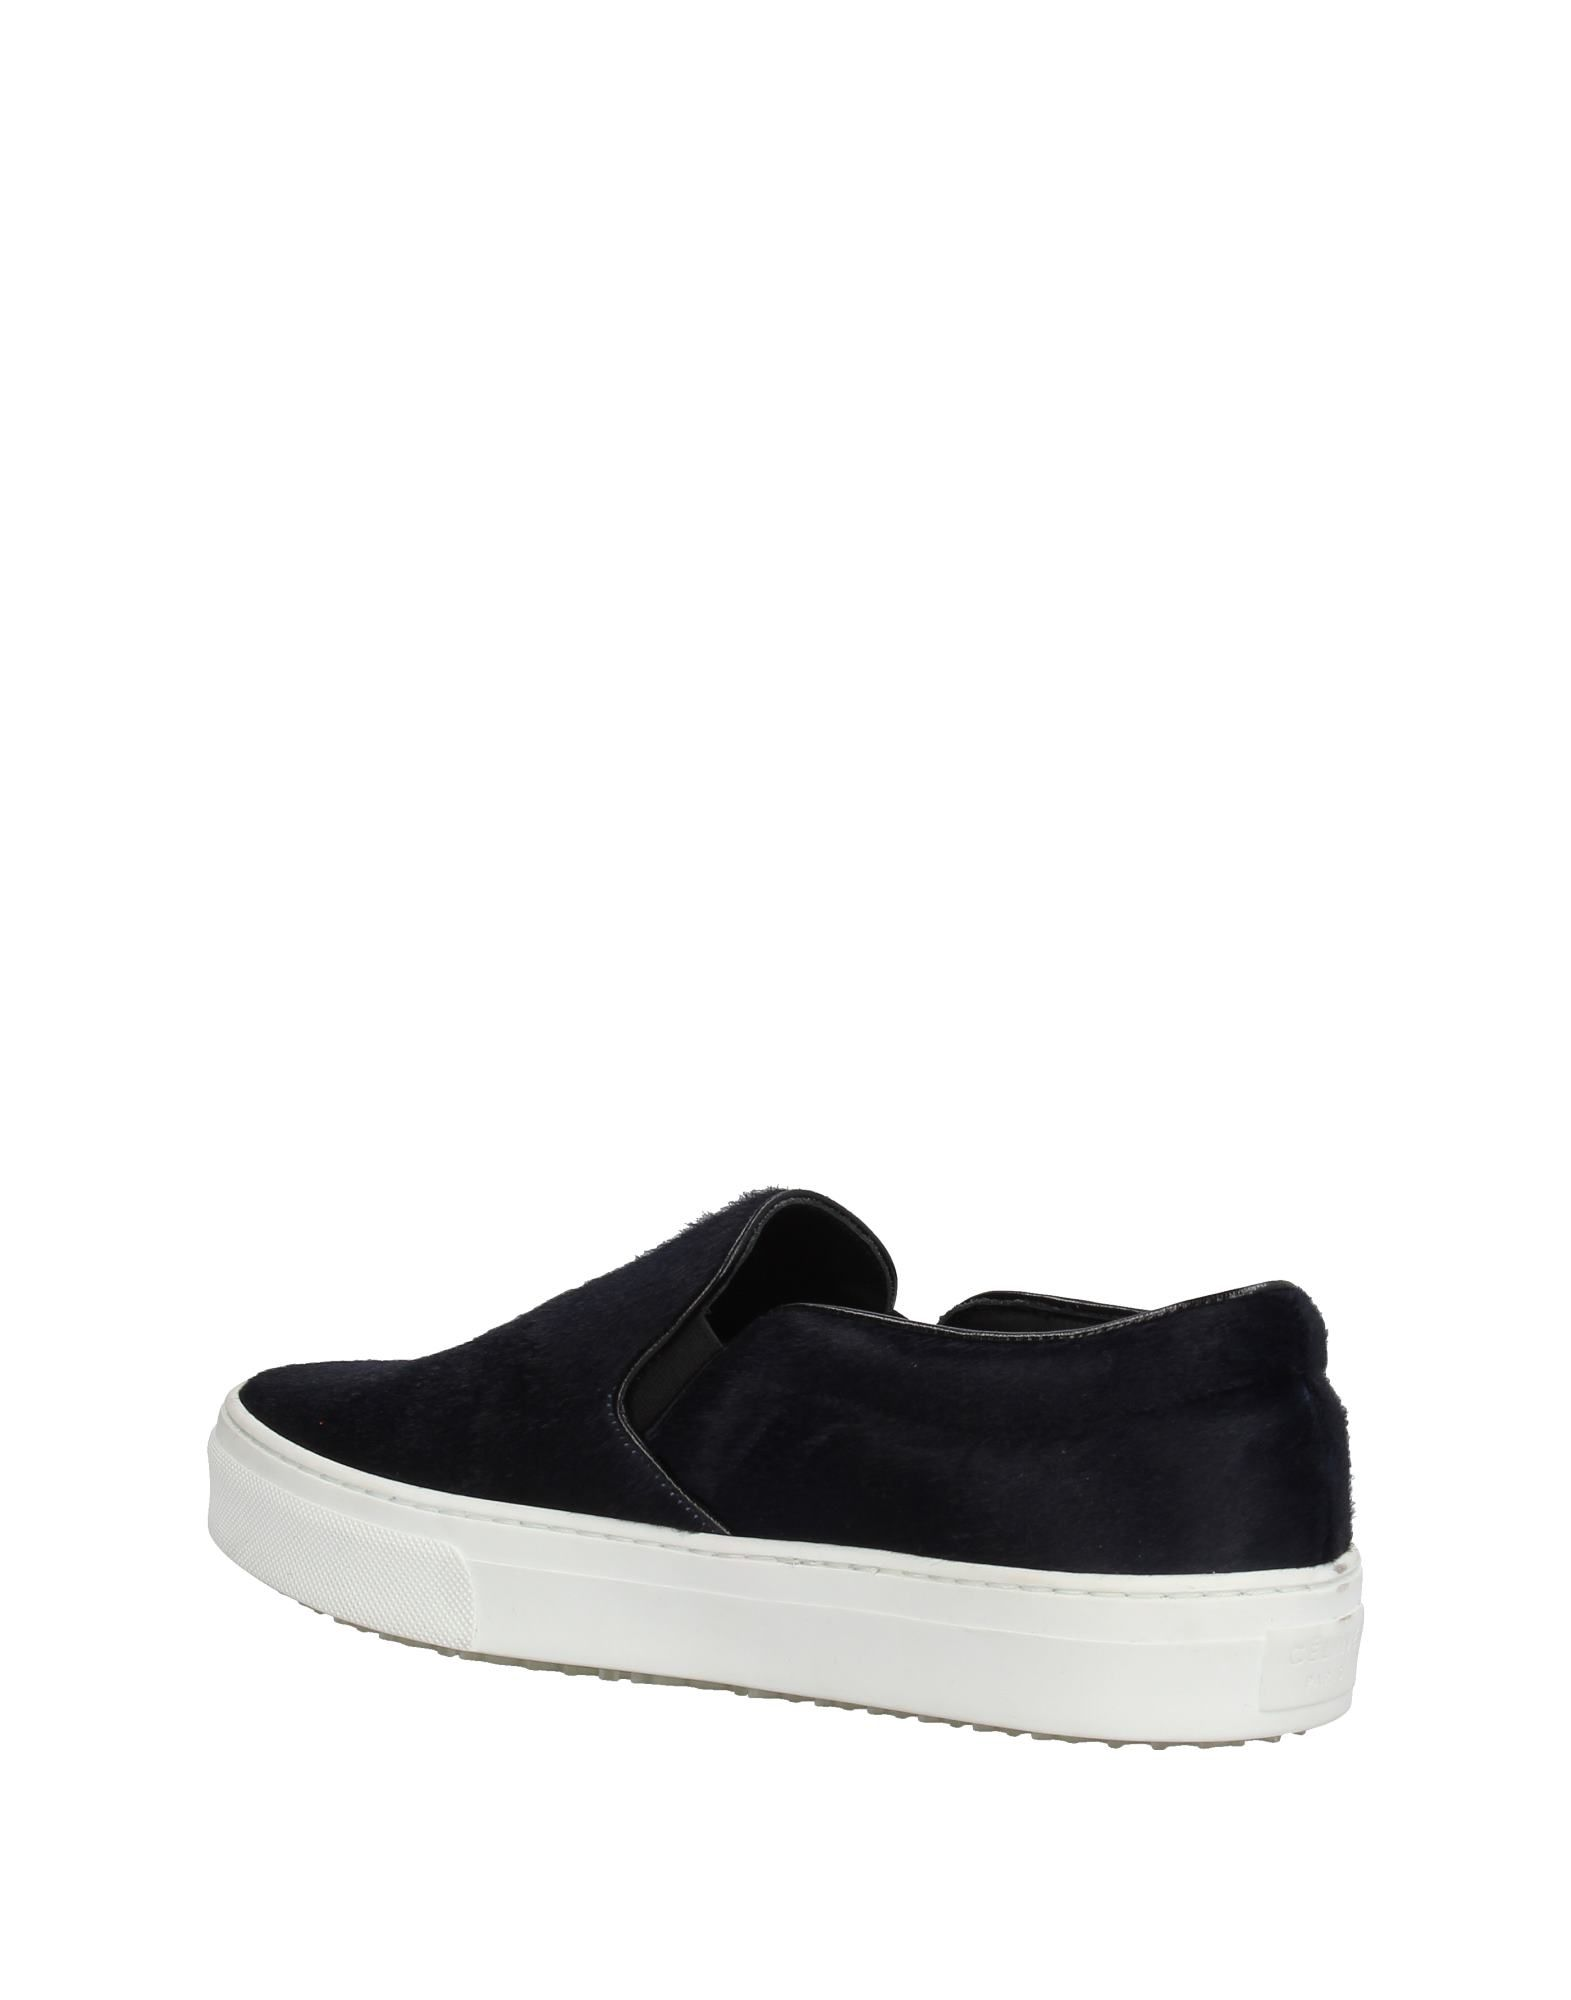 Celine Sneakers Damen gut  11214398HTGünstige gut Damen aussehende Schuhe 629fde